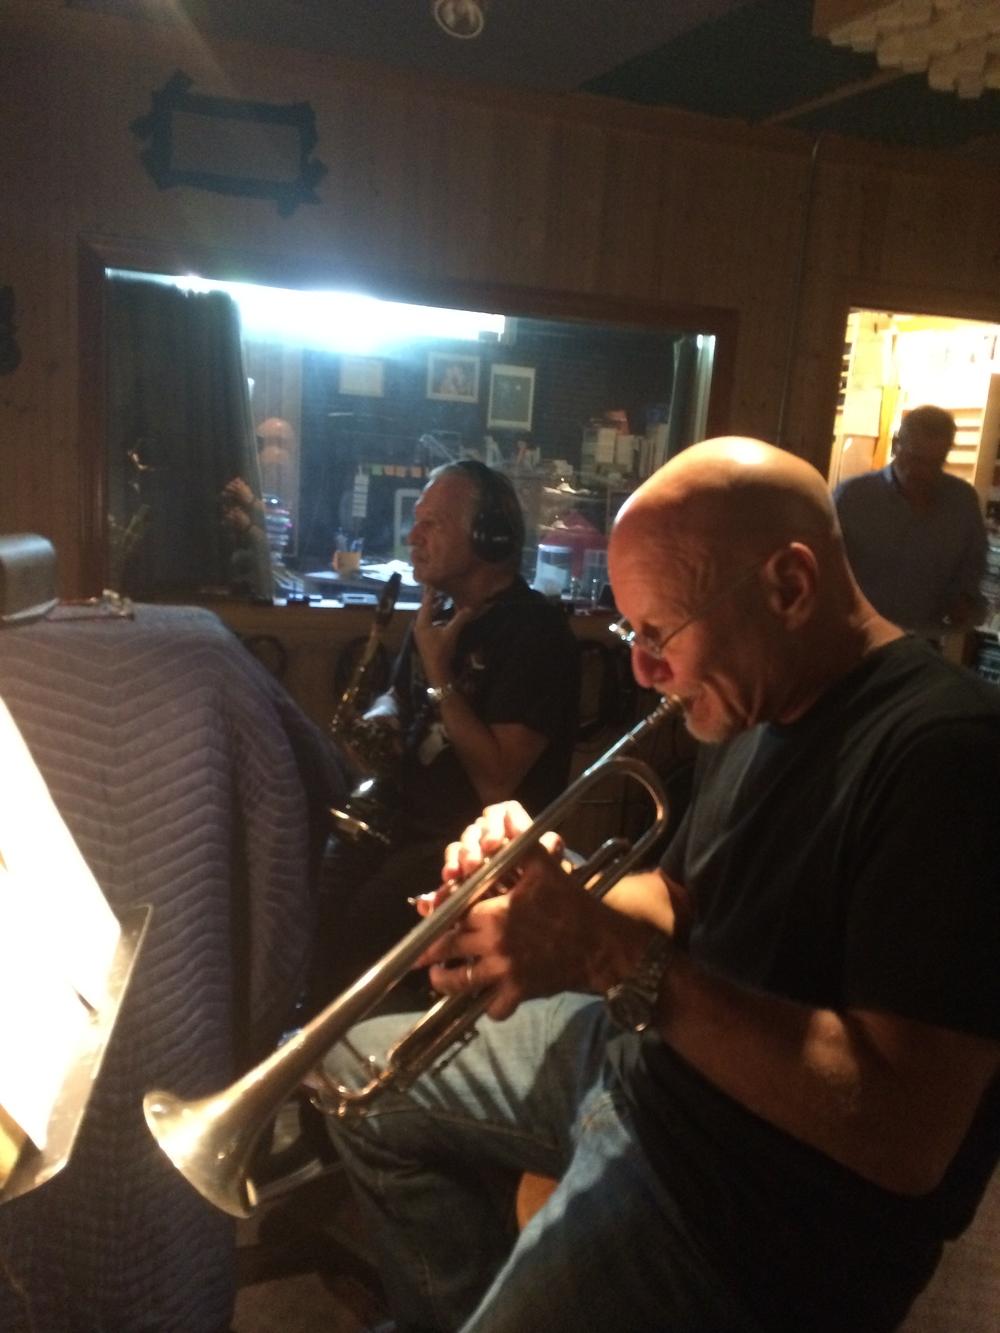 Jerry Bergonzi, Ken Certvenka, at PBS Studios, Westwood, MA 2014